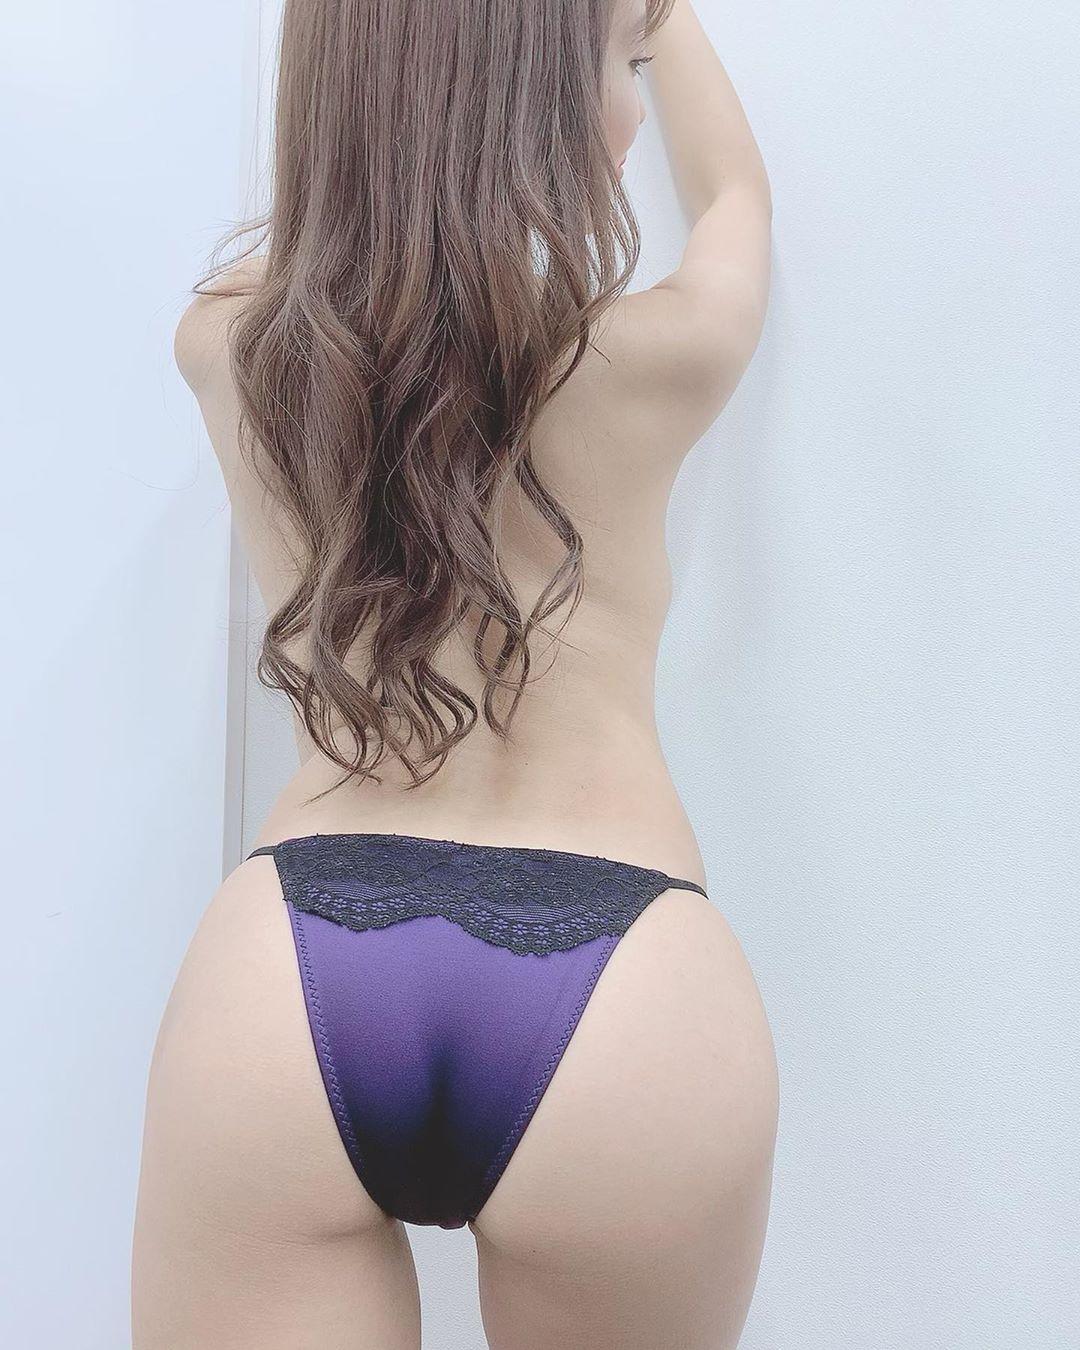 morisaki_tomomi176.jpg